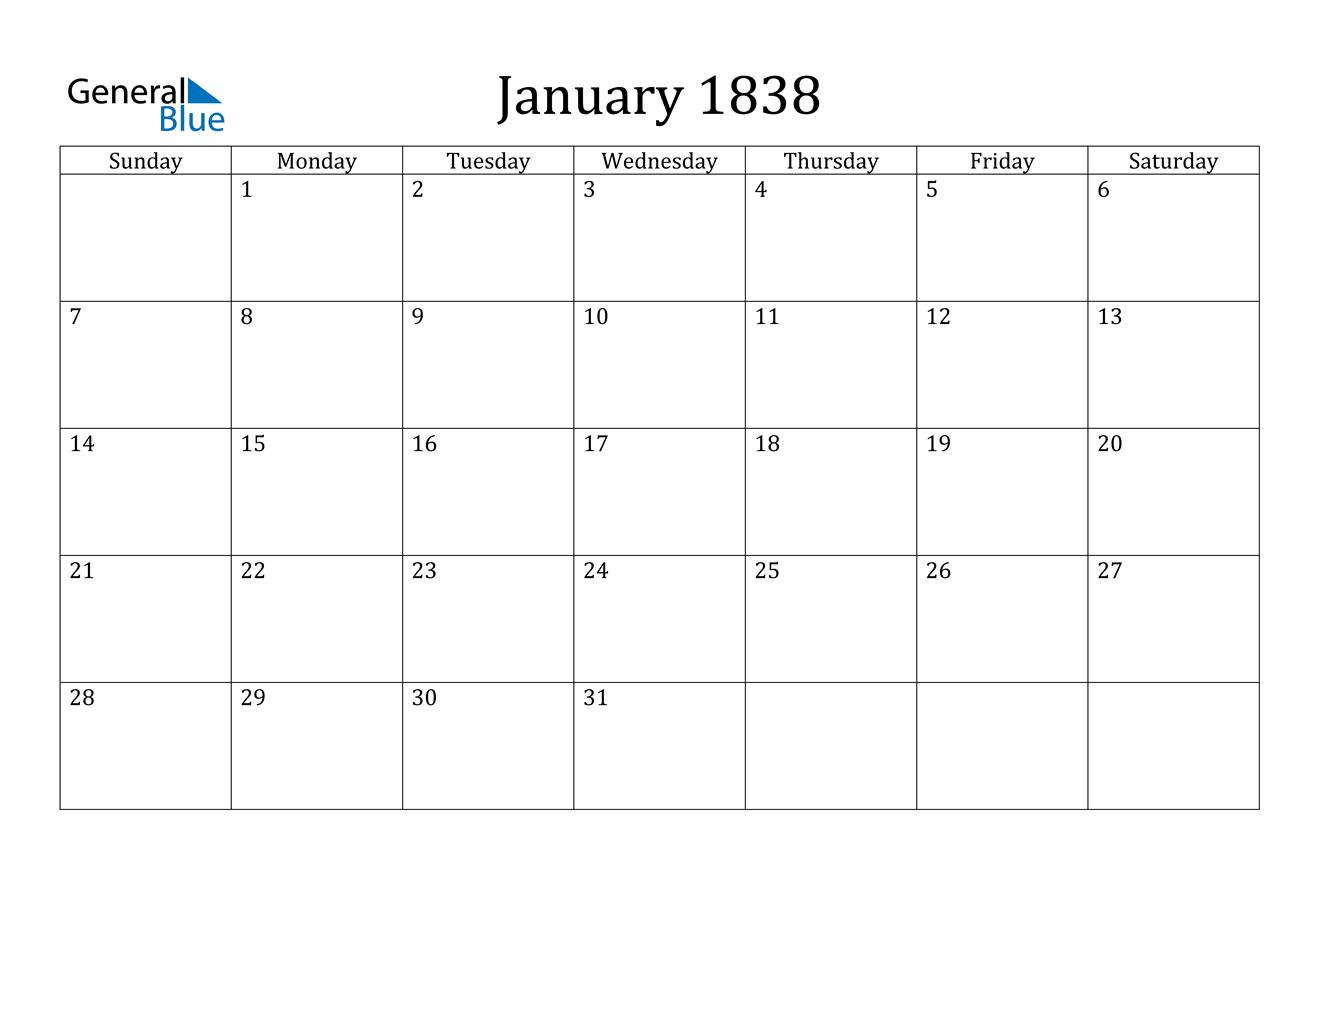 Image of January 1838 Calendar